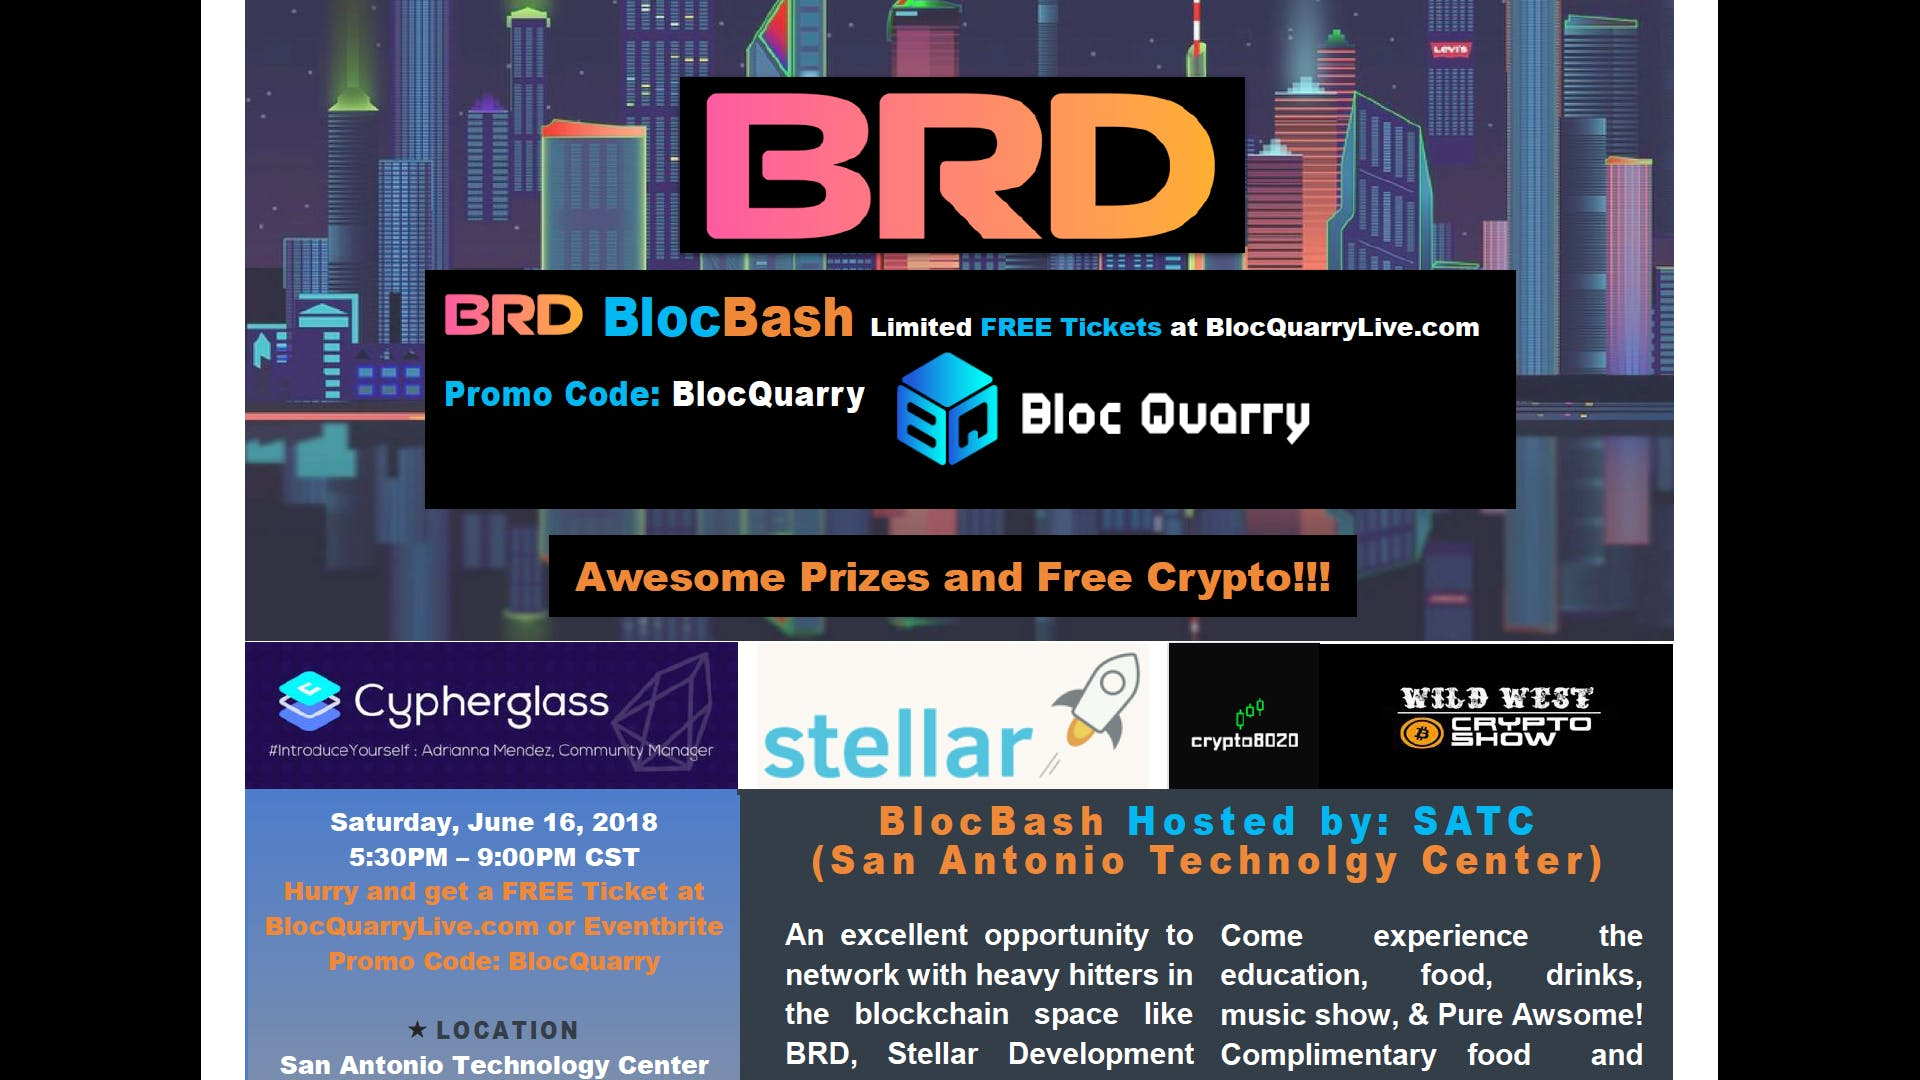 'Bloc Bash' Signals Growing Blockchain Community in San Antonio